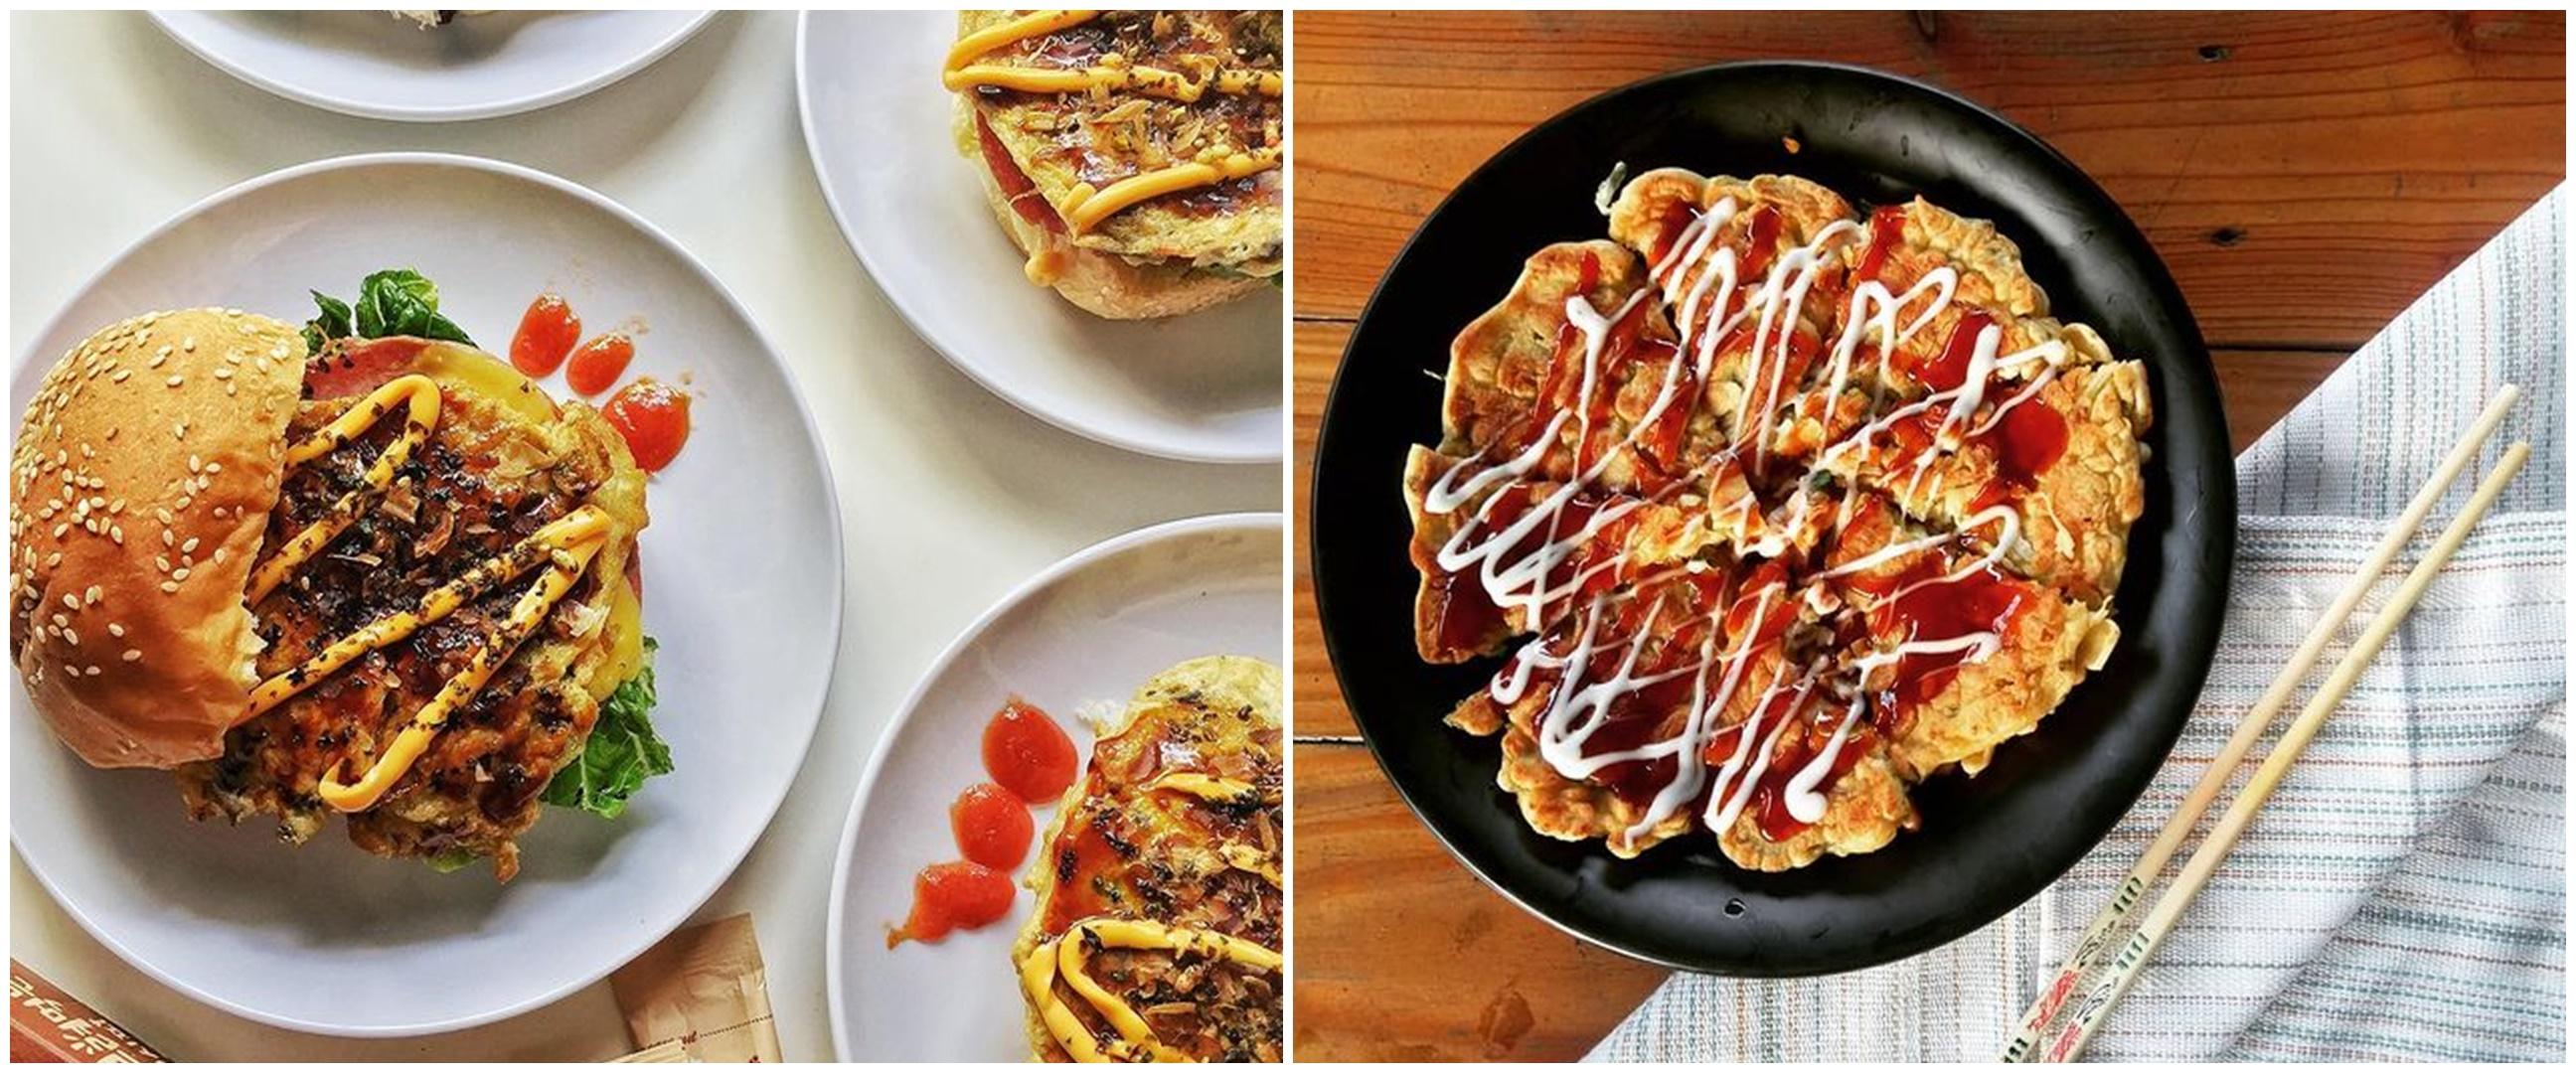 8 Resep okonomiyaki camilan khas Jepang, nikmat dan bikin nagih